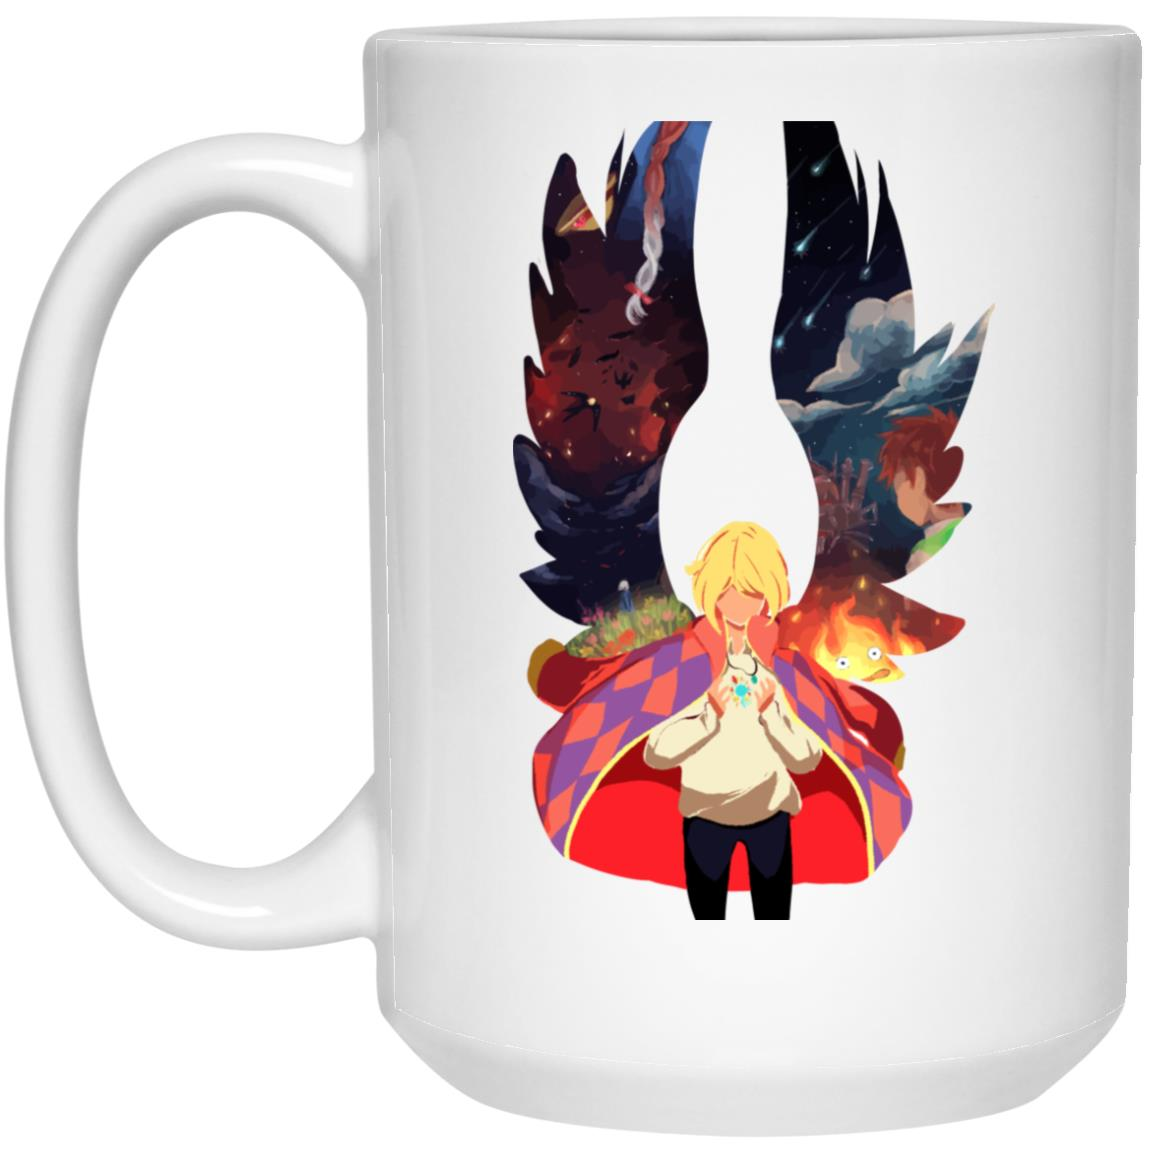 Howl and Colorful Wings Mug